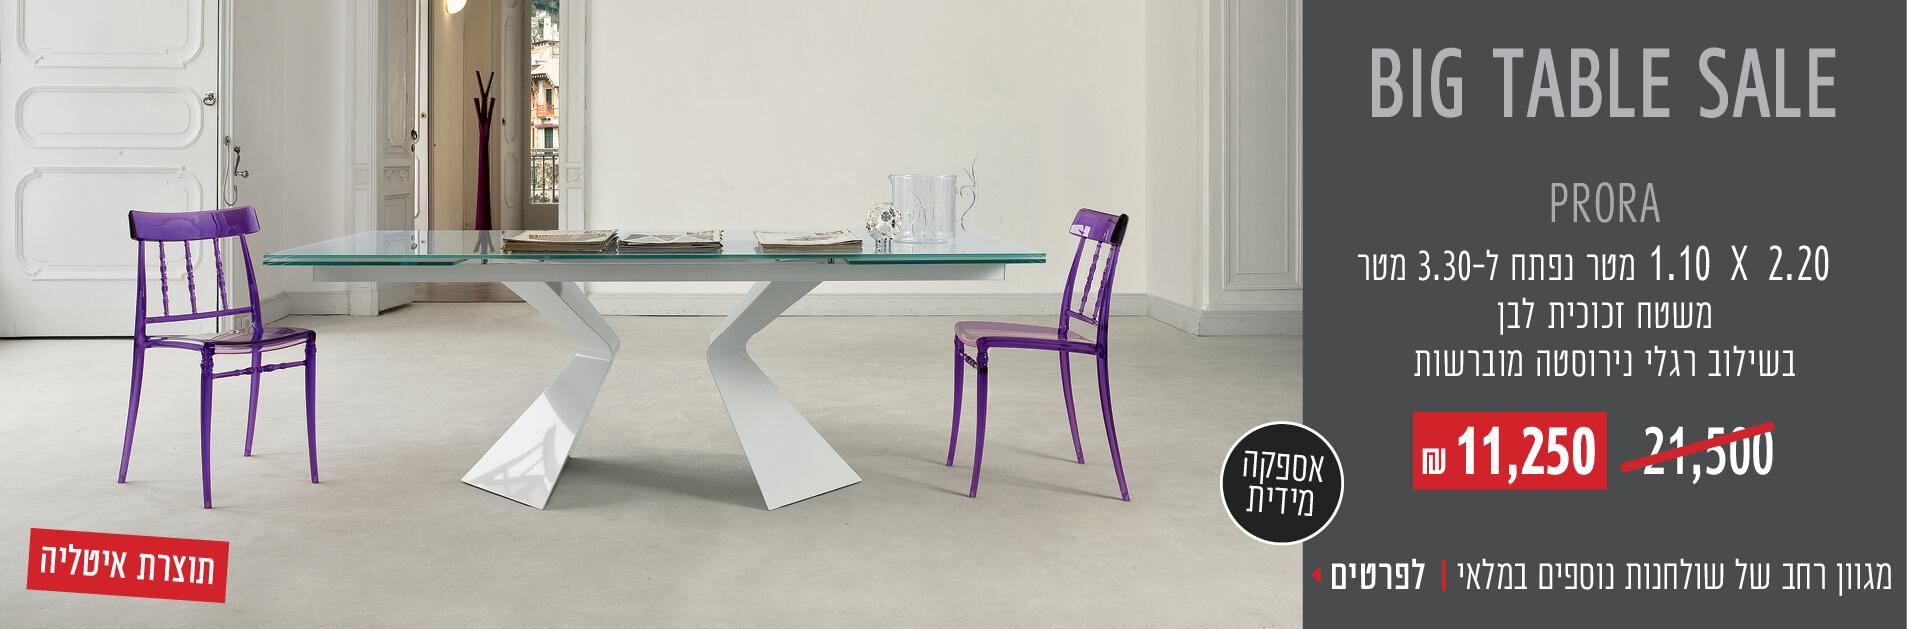 table_sale4